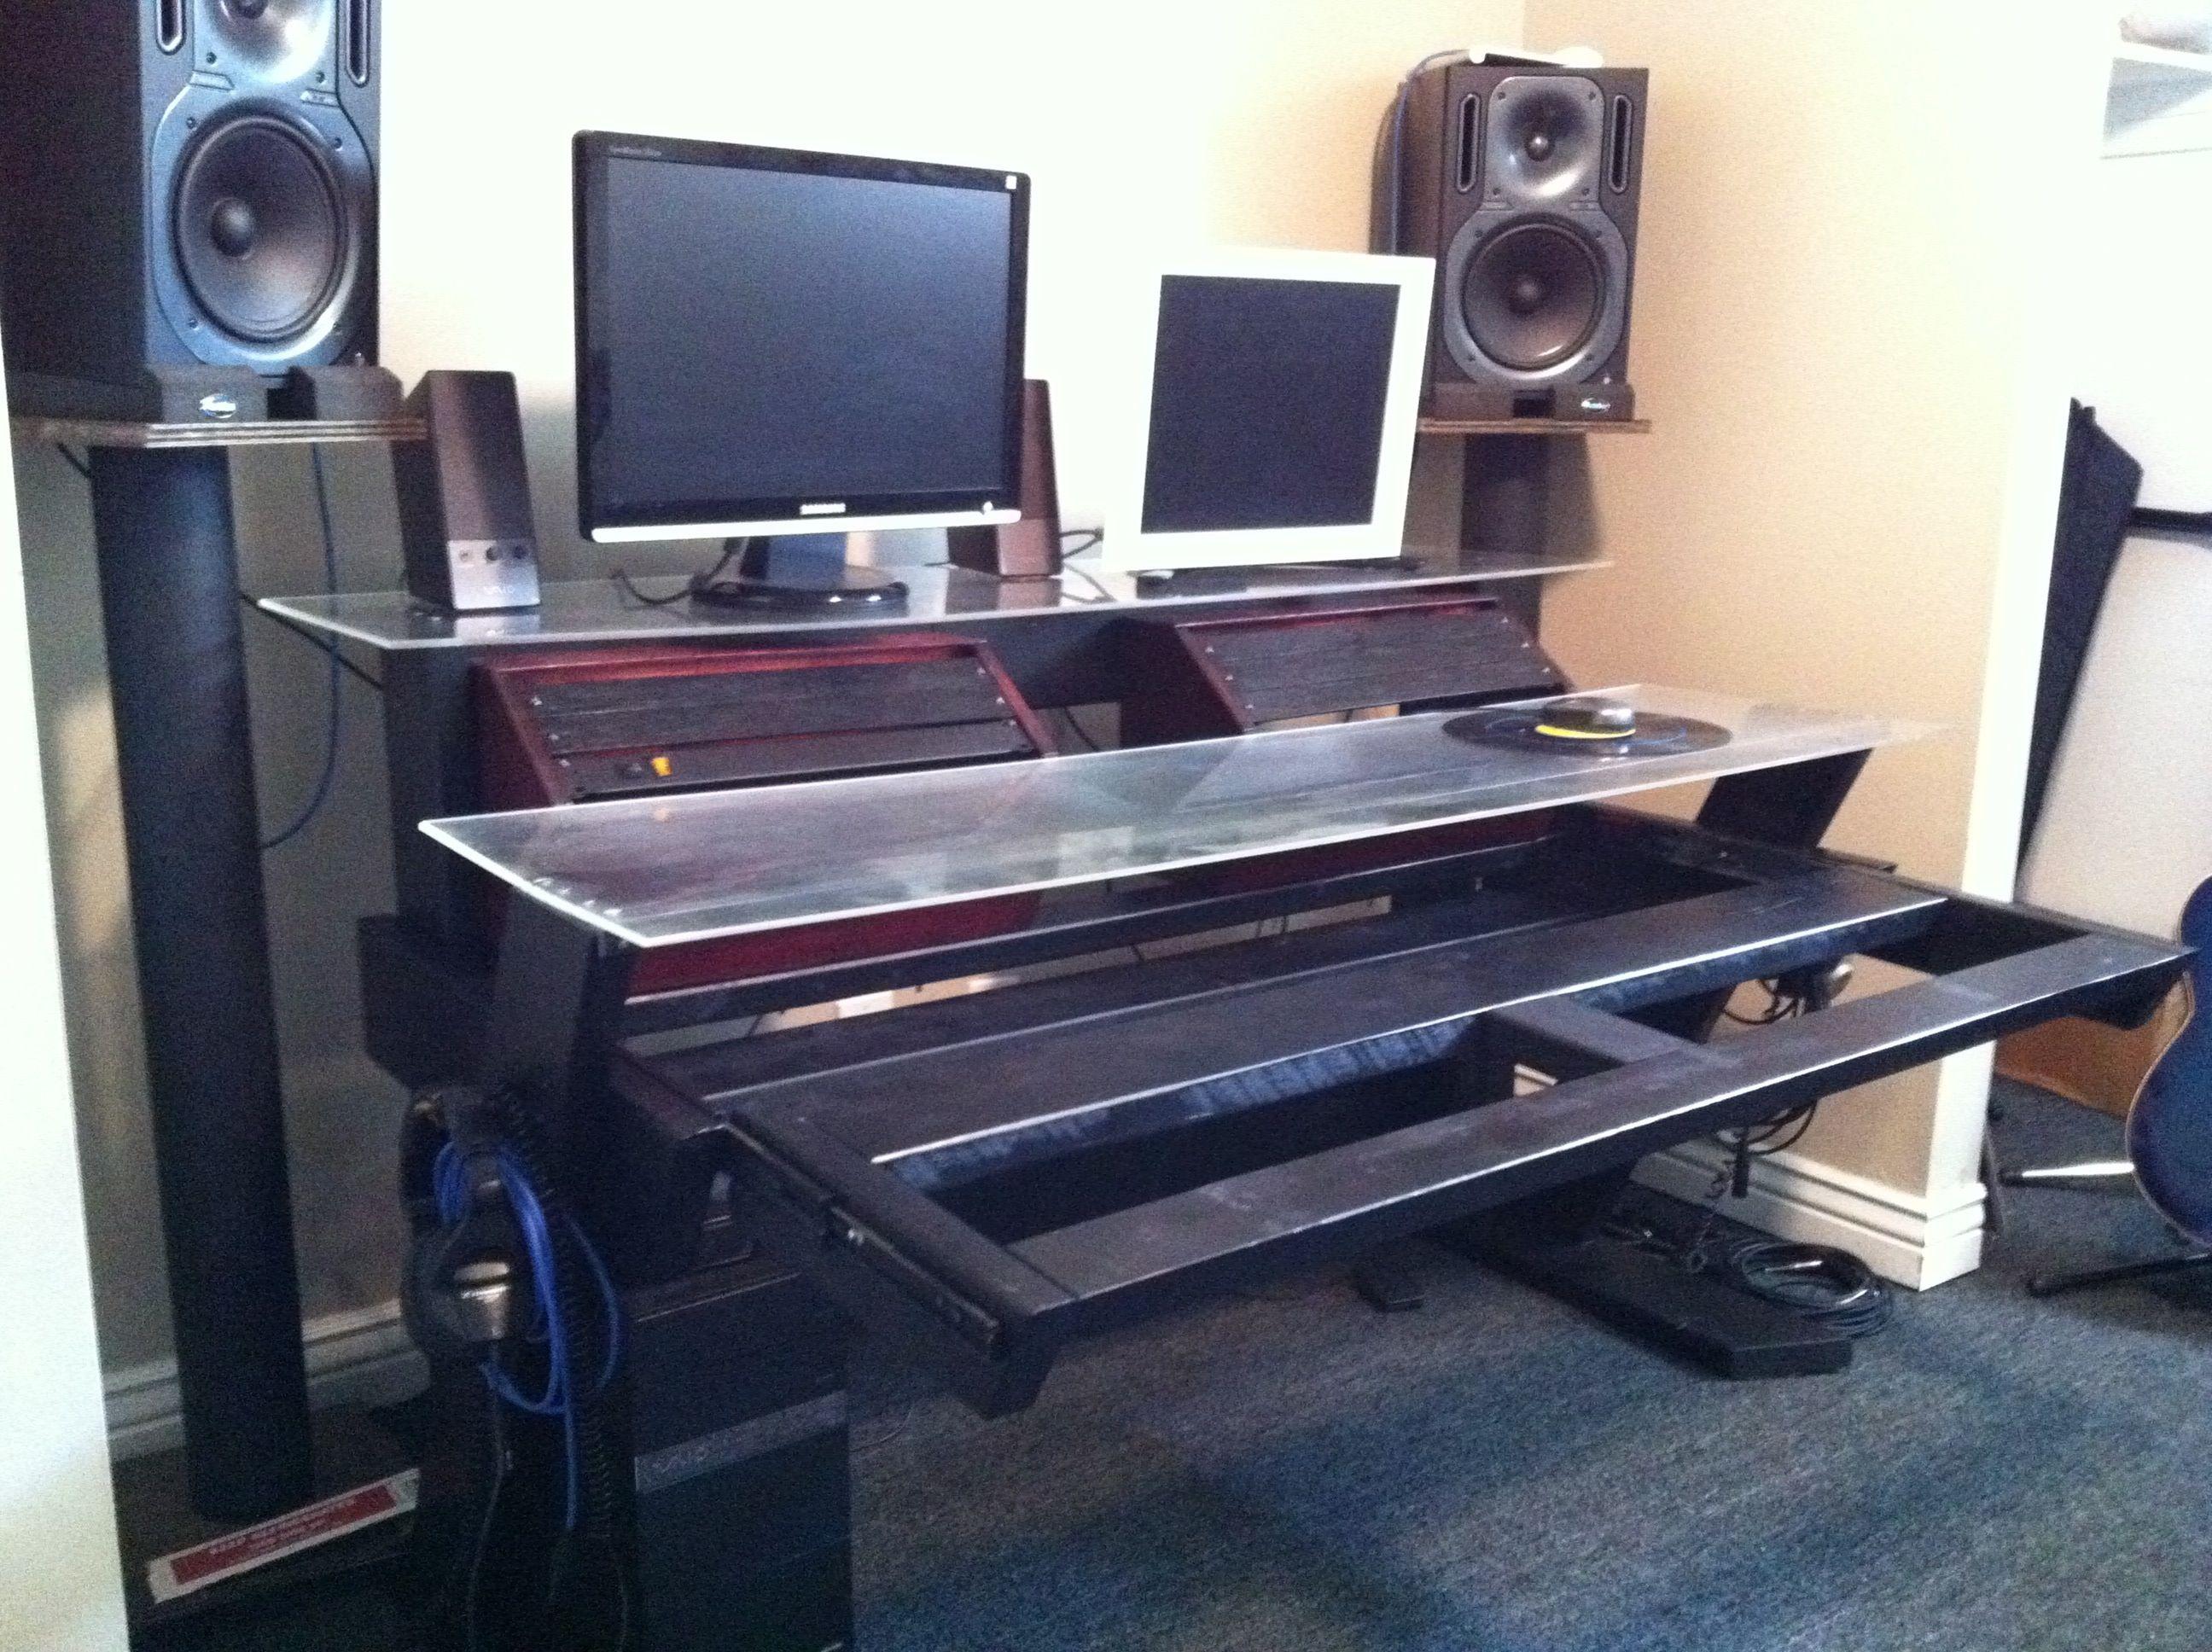 Office Chair Under 3000 Light Blue Covers Diy Studio Desk Keyboard Workstation Img 2304 Jpg